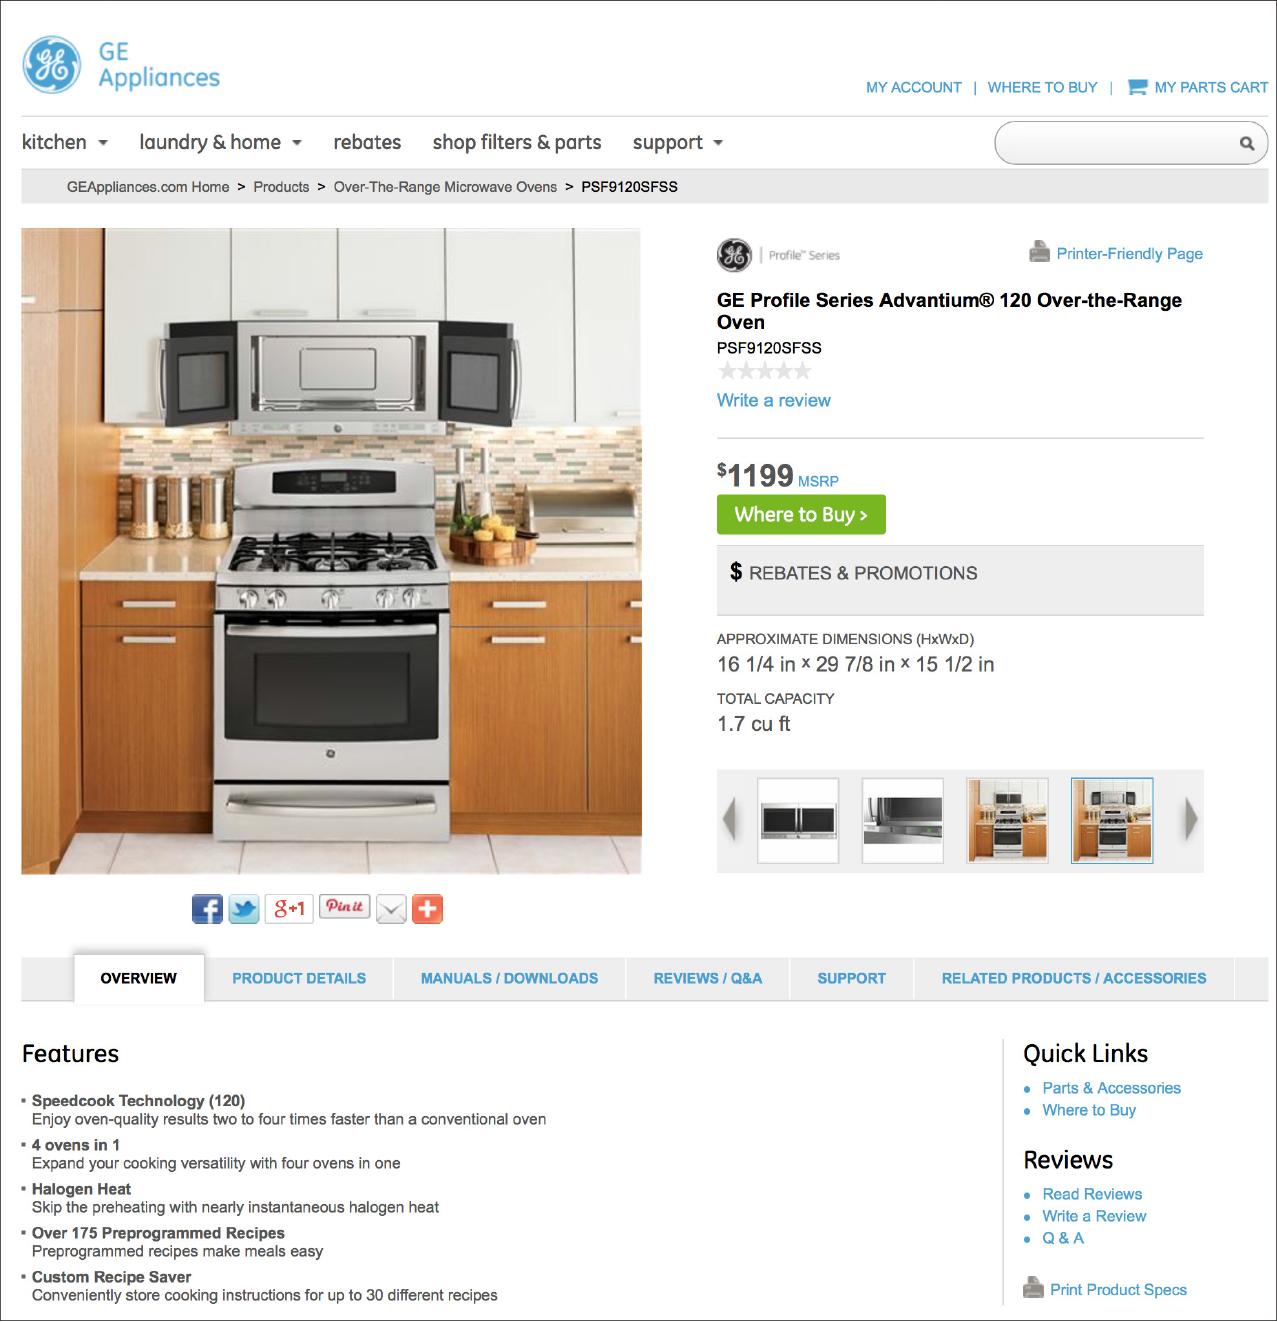 Live pages on GEAppliances.com